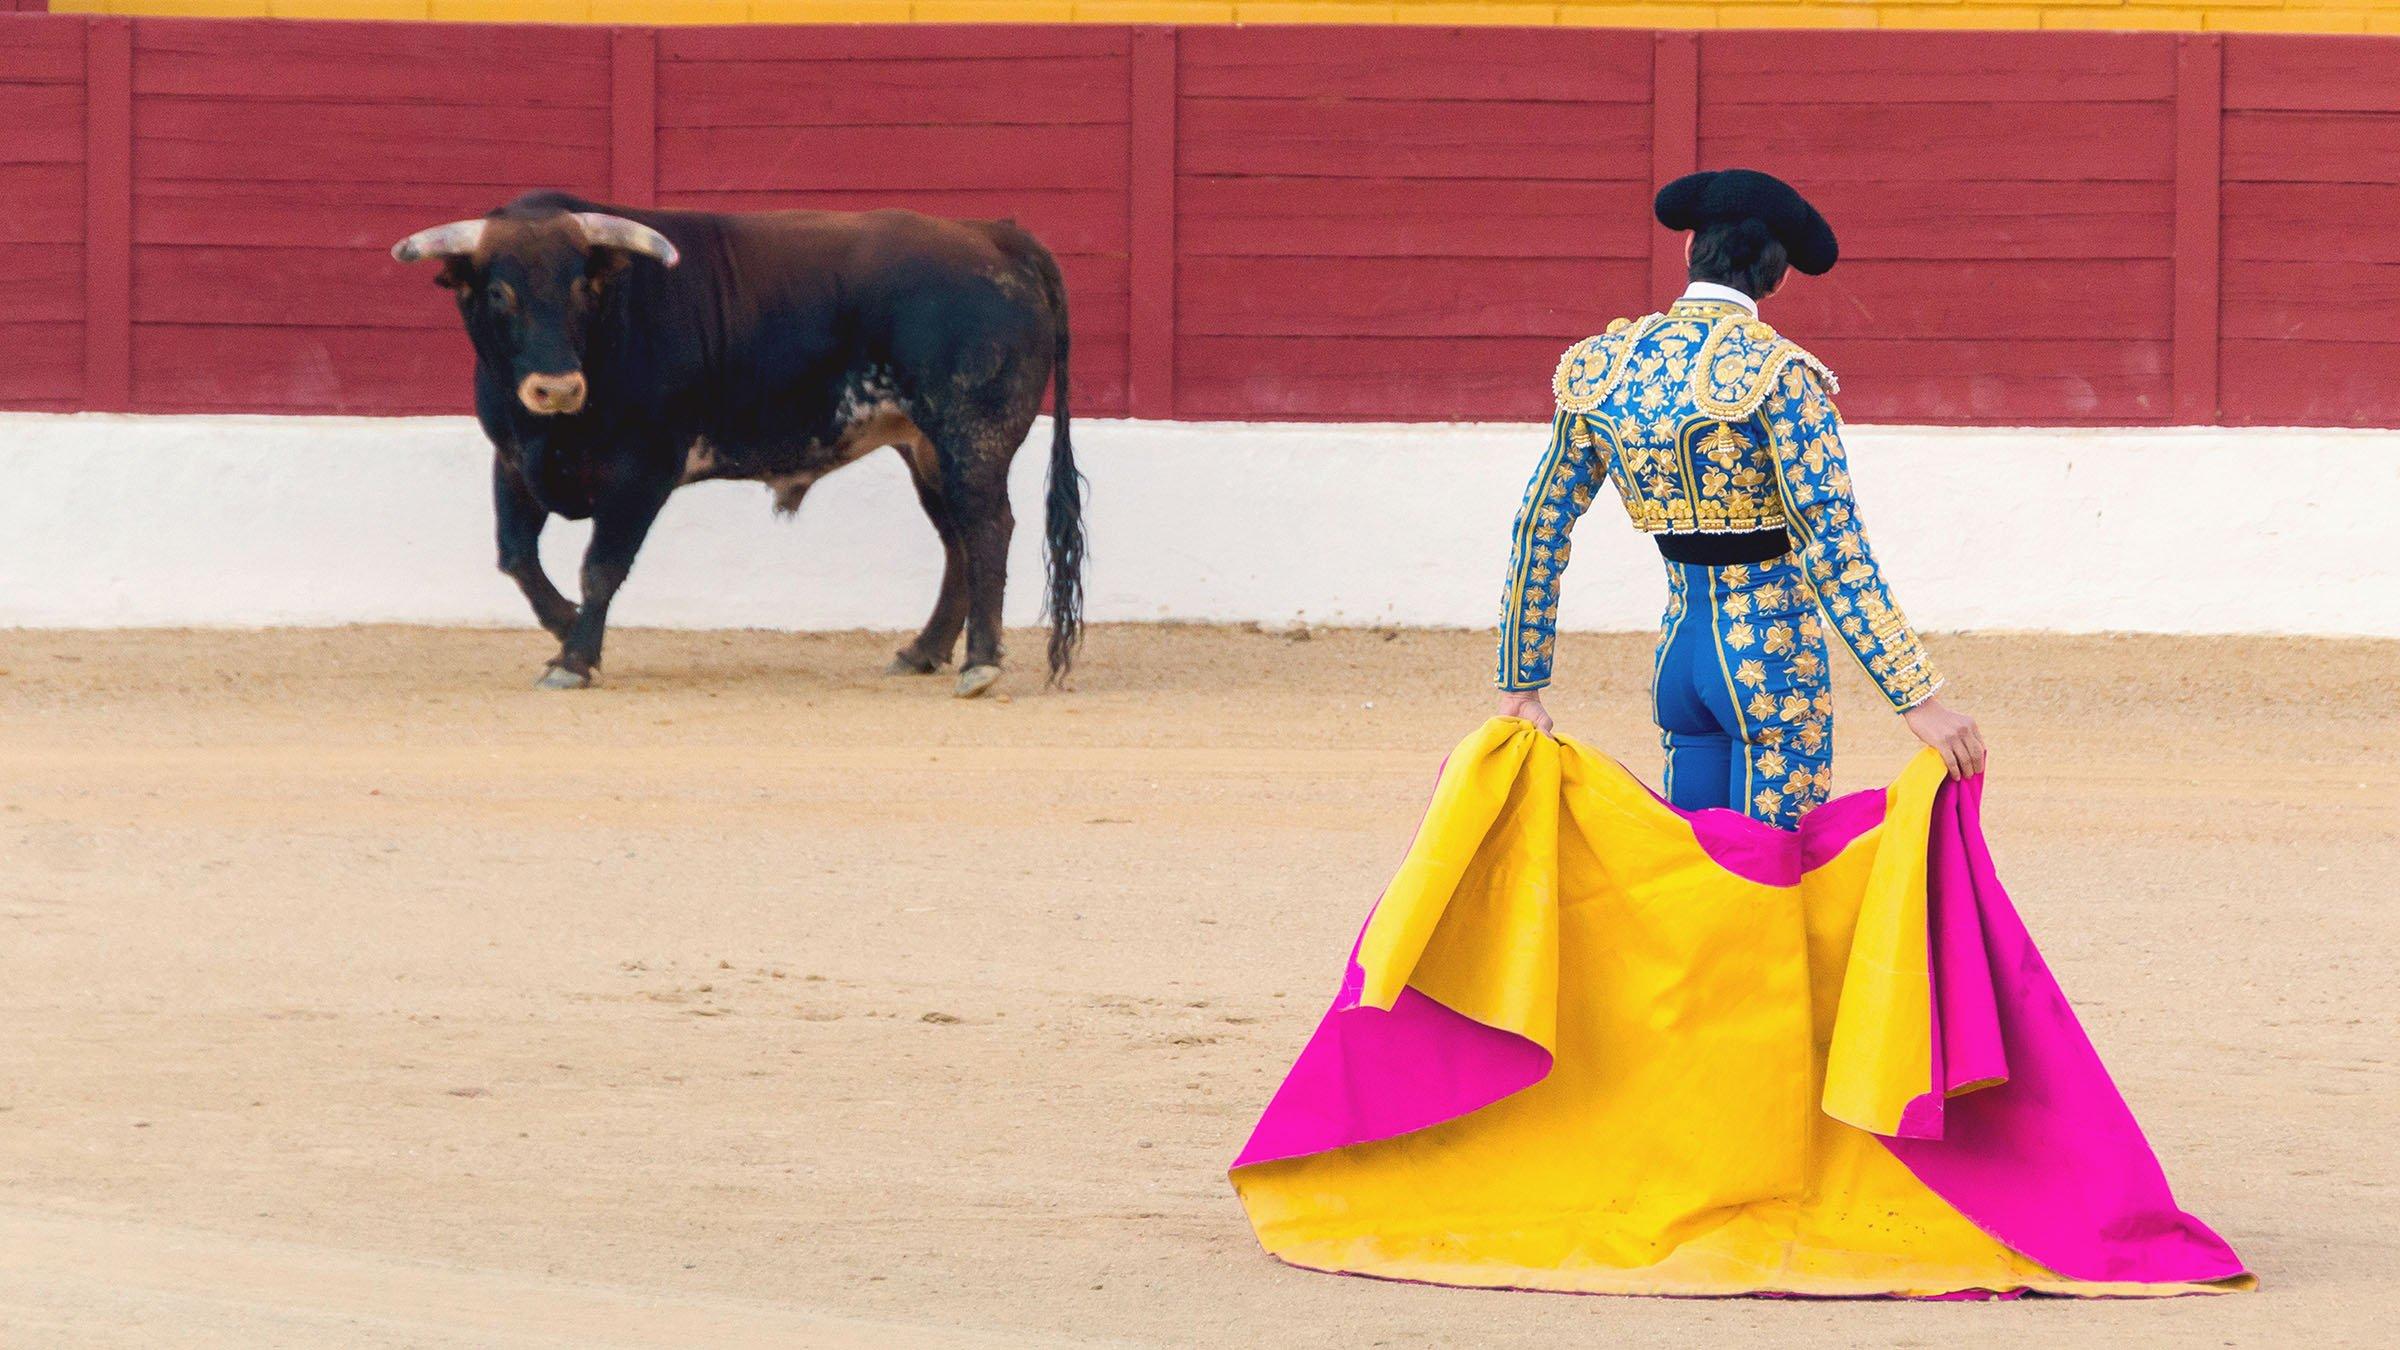 Bull and bullfighter in Spain